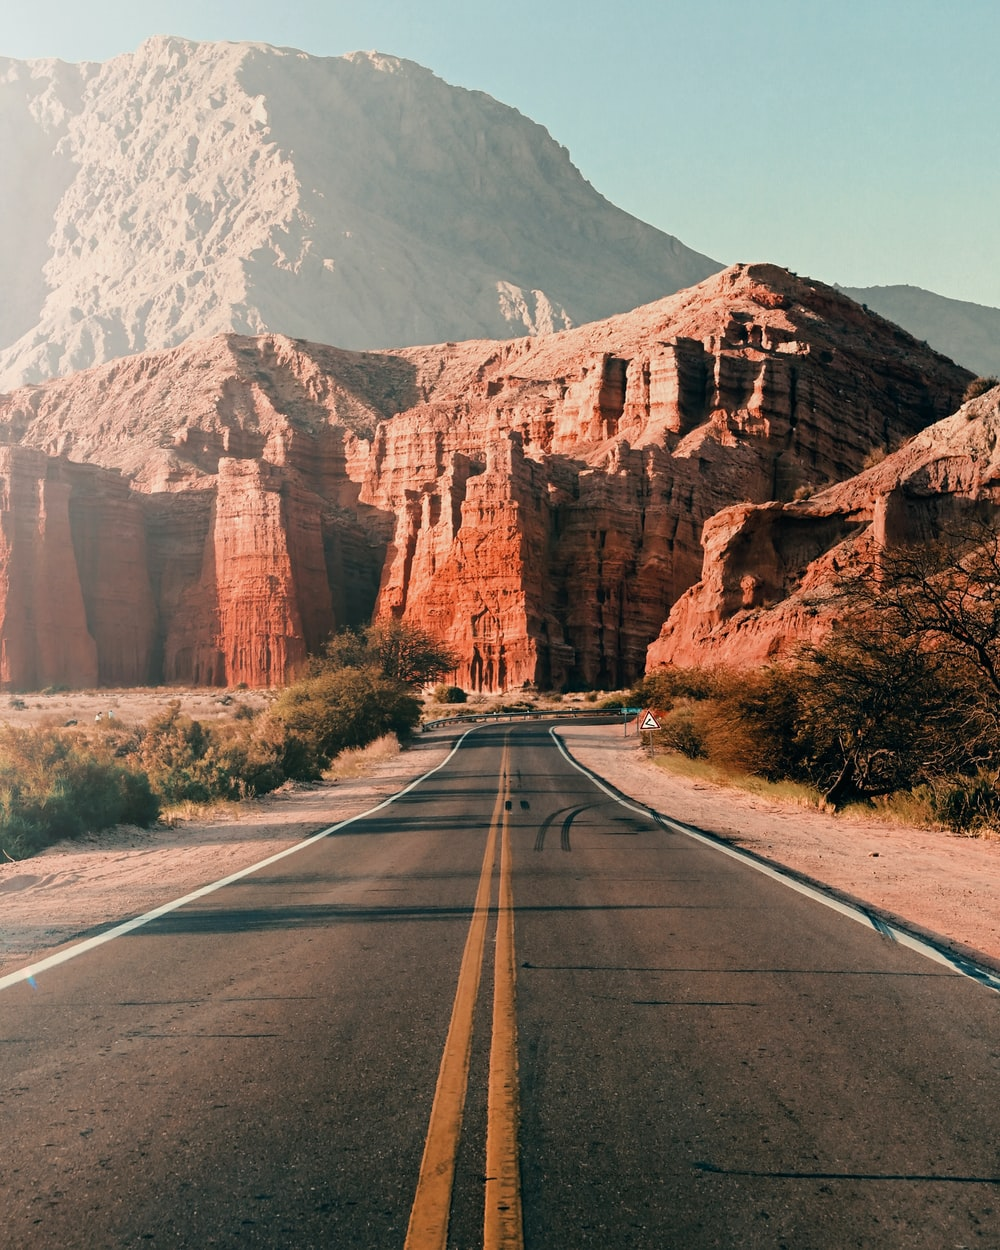 gray asphalt road near brown mountain during daytime